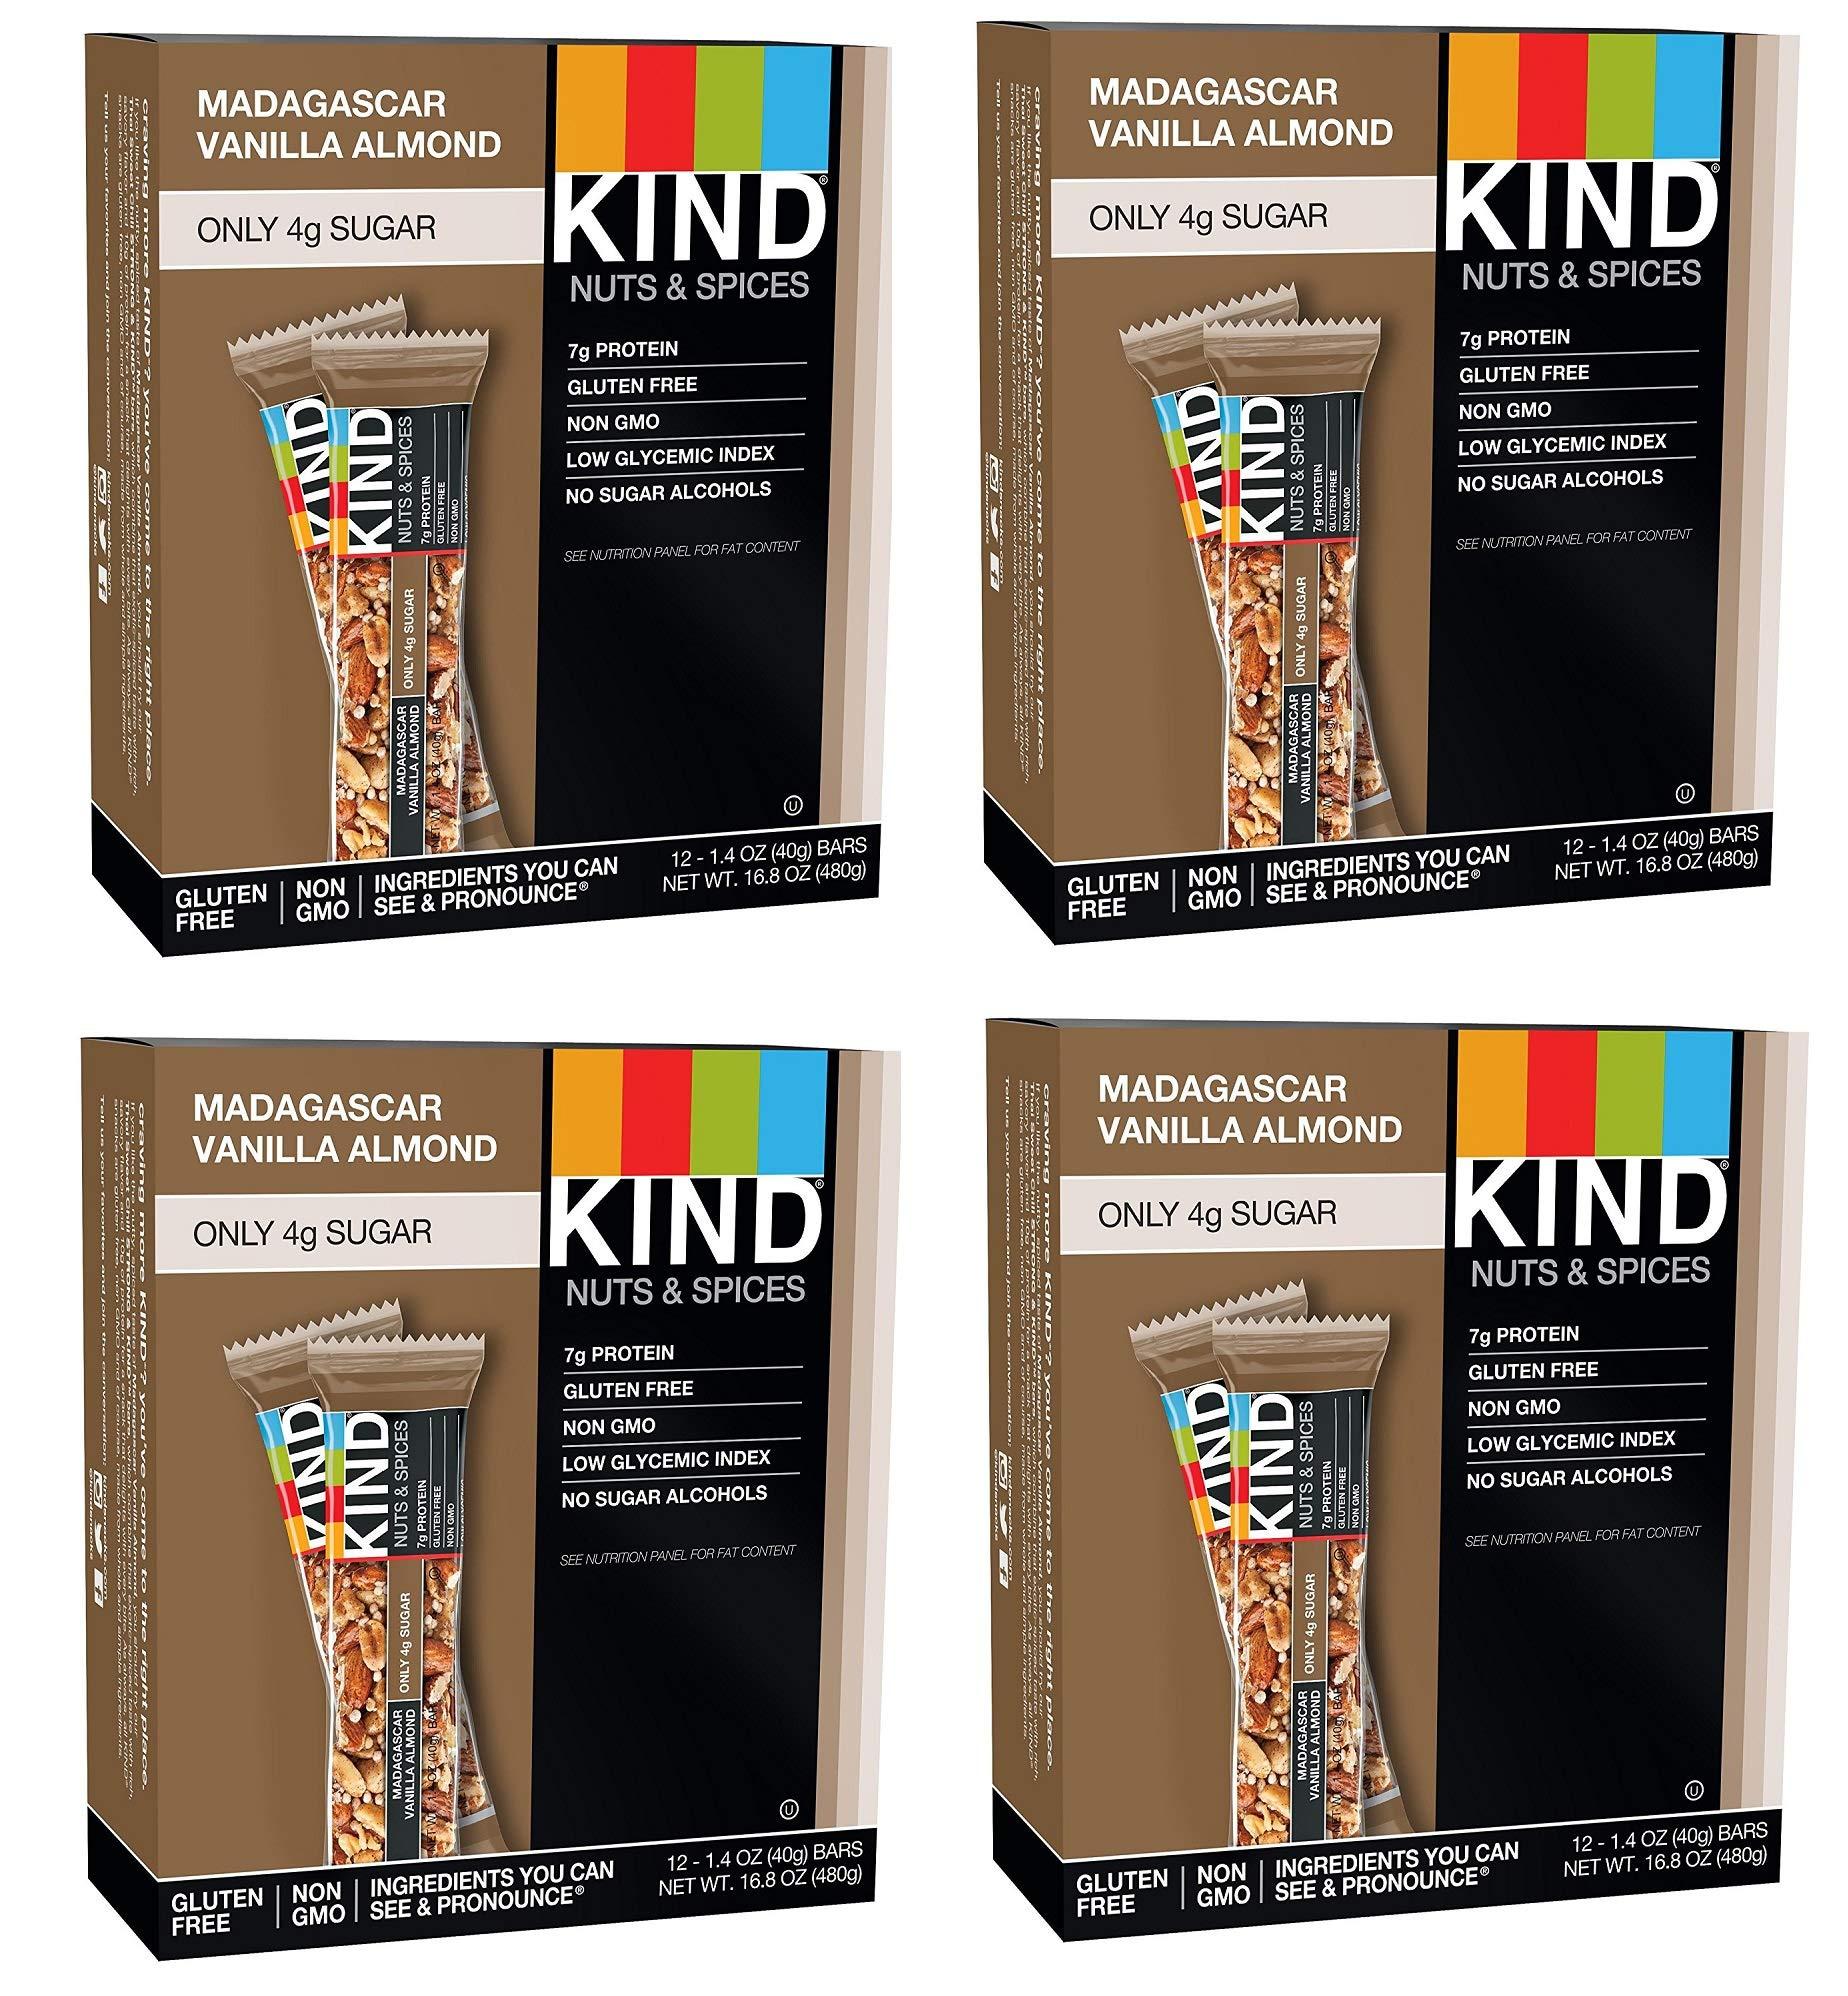 KIND Bars, Madagascar Vanilla Almond, Gluten Free, Low Sugar, 1.4oz, 48 Bars